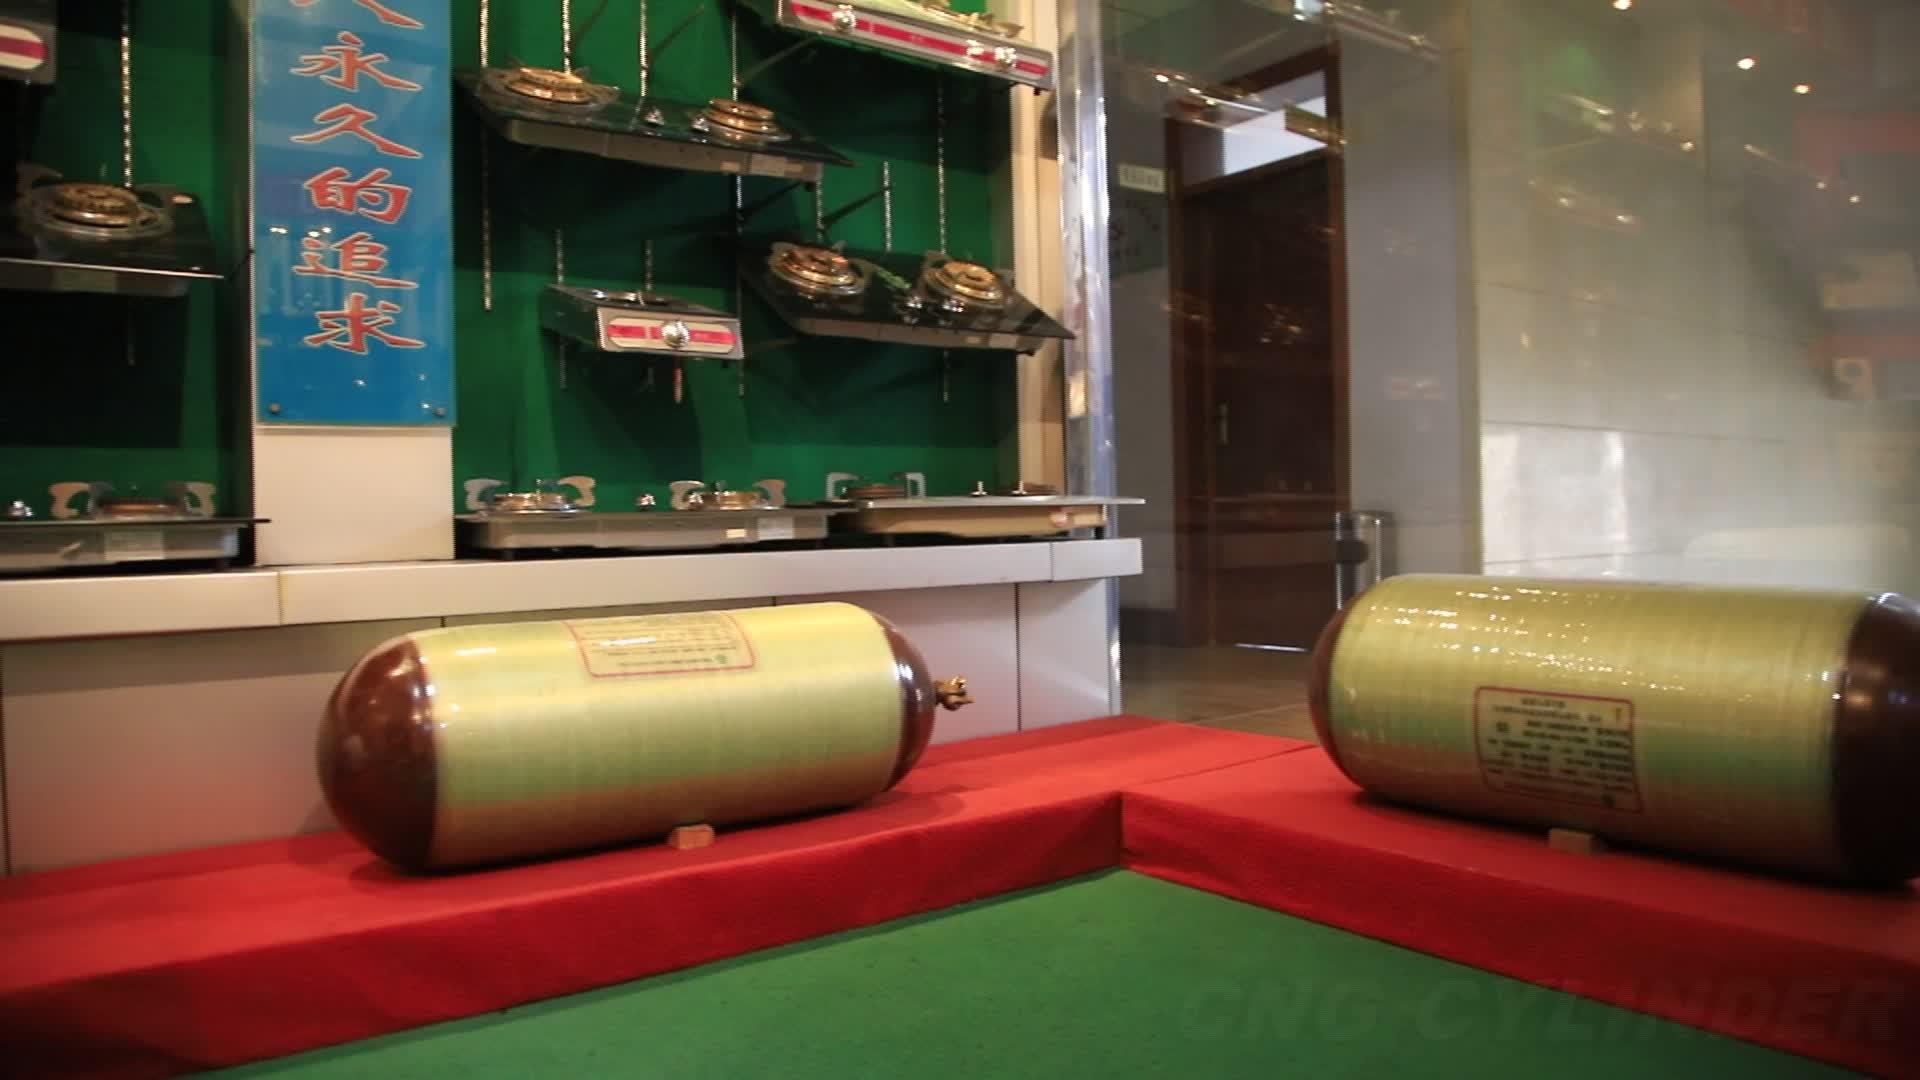 चीन उच्च गुणवत्ता प्रकार 2 सीएनजी गैस सिलेंडर